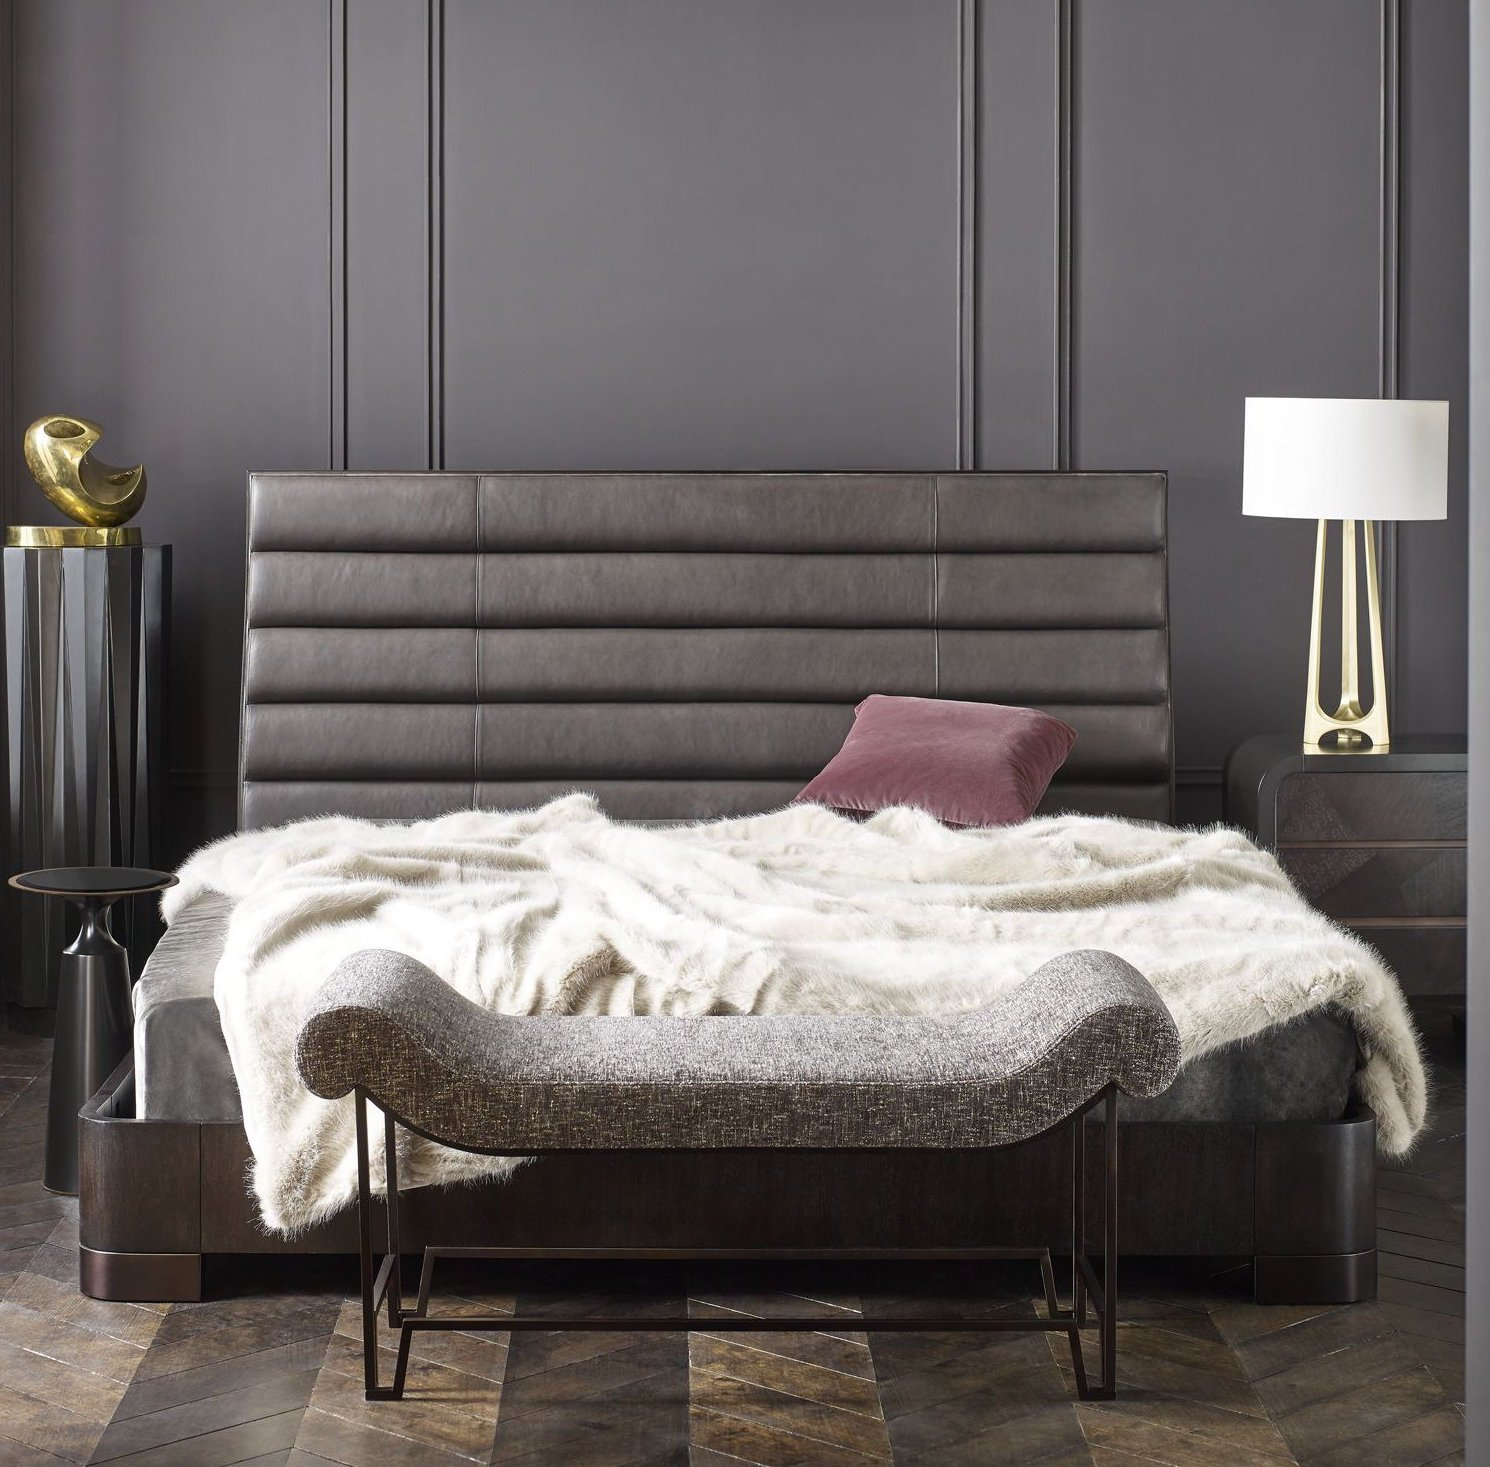 Miami Bedroom Design Trends for 2020   Decor House Furniture